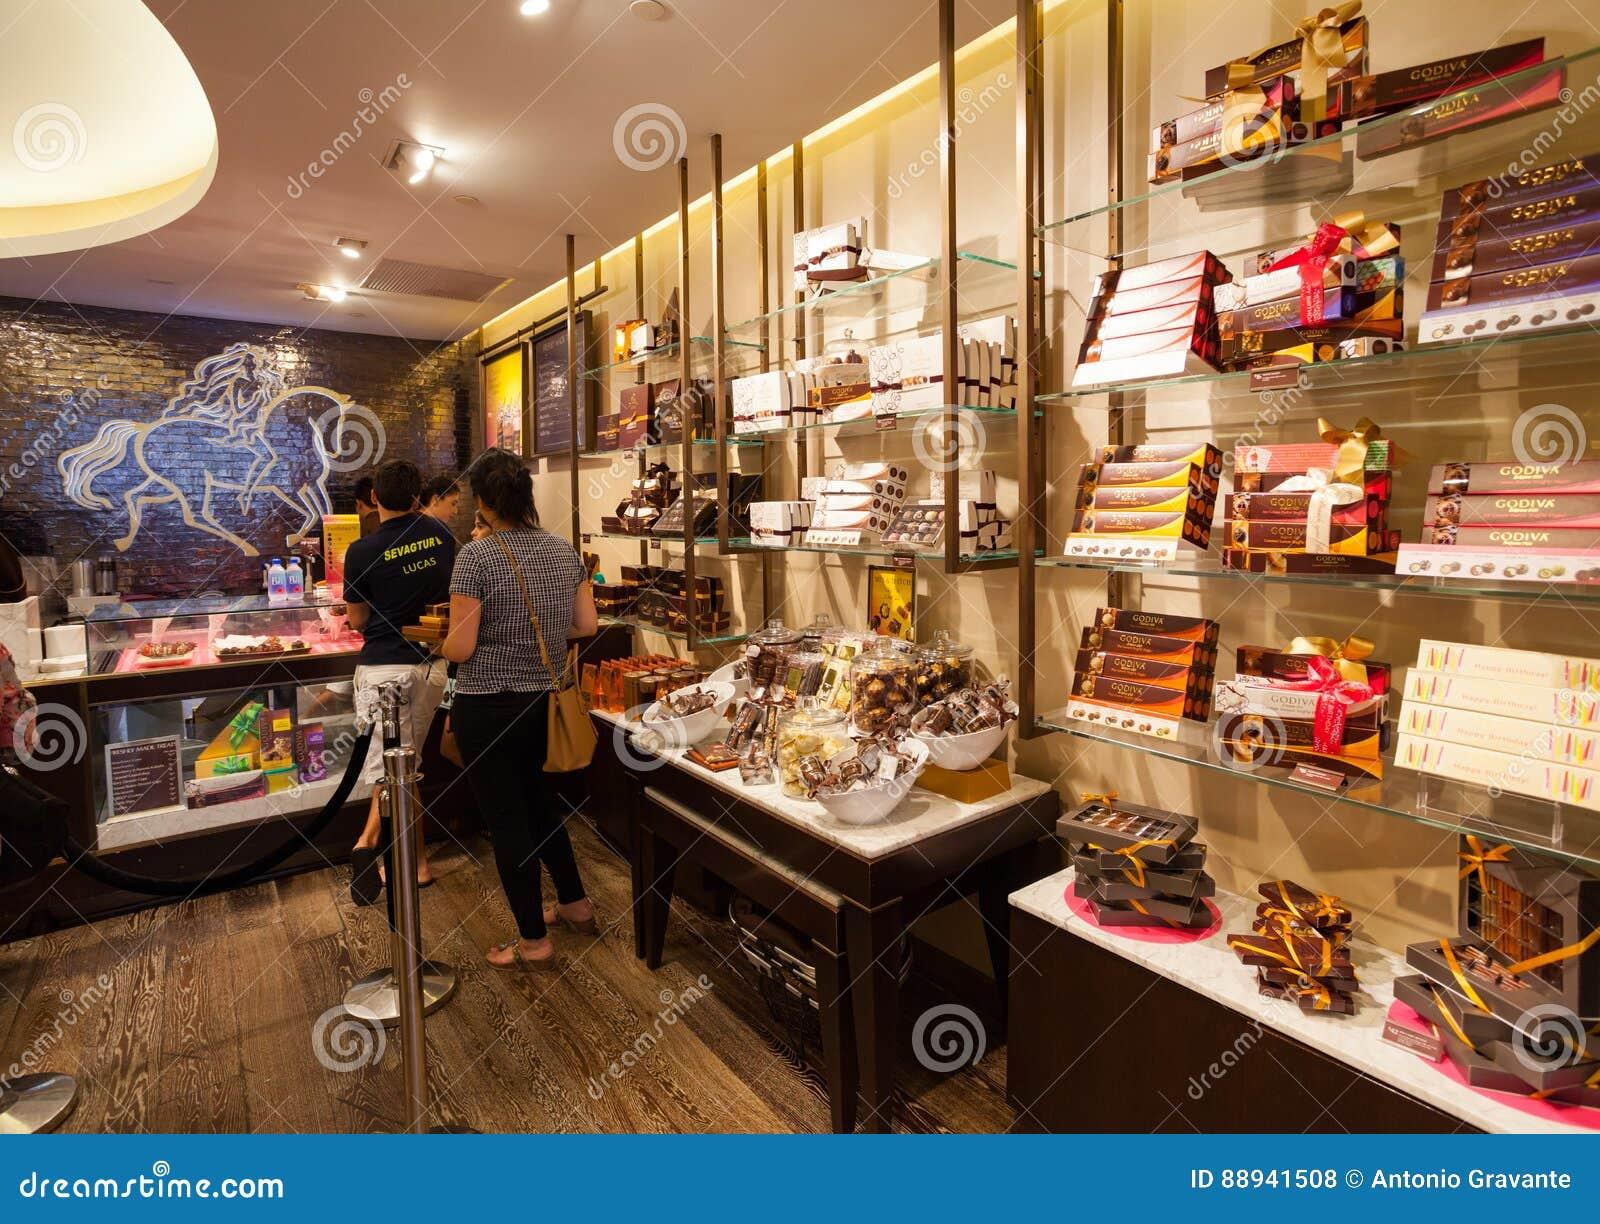 Godiva Chocolate Store Fifth Avenue In Manhattan Editorial Stock ...